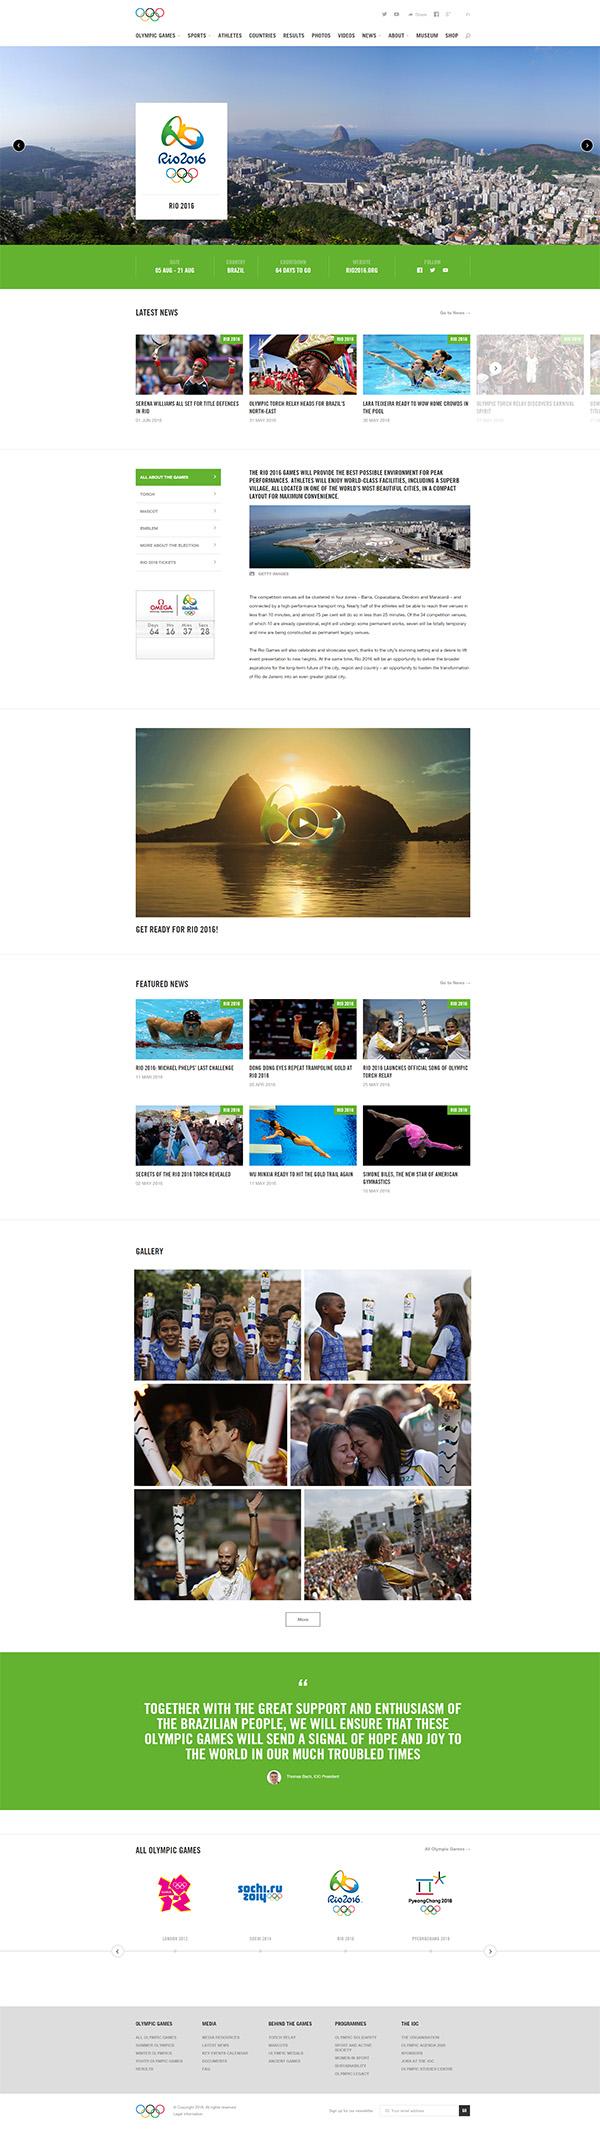 New website IOC June 2016 2